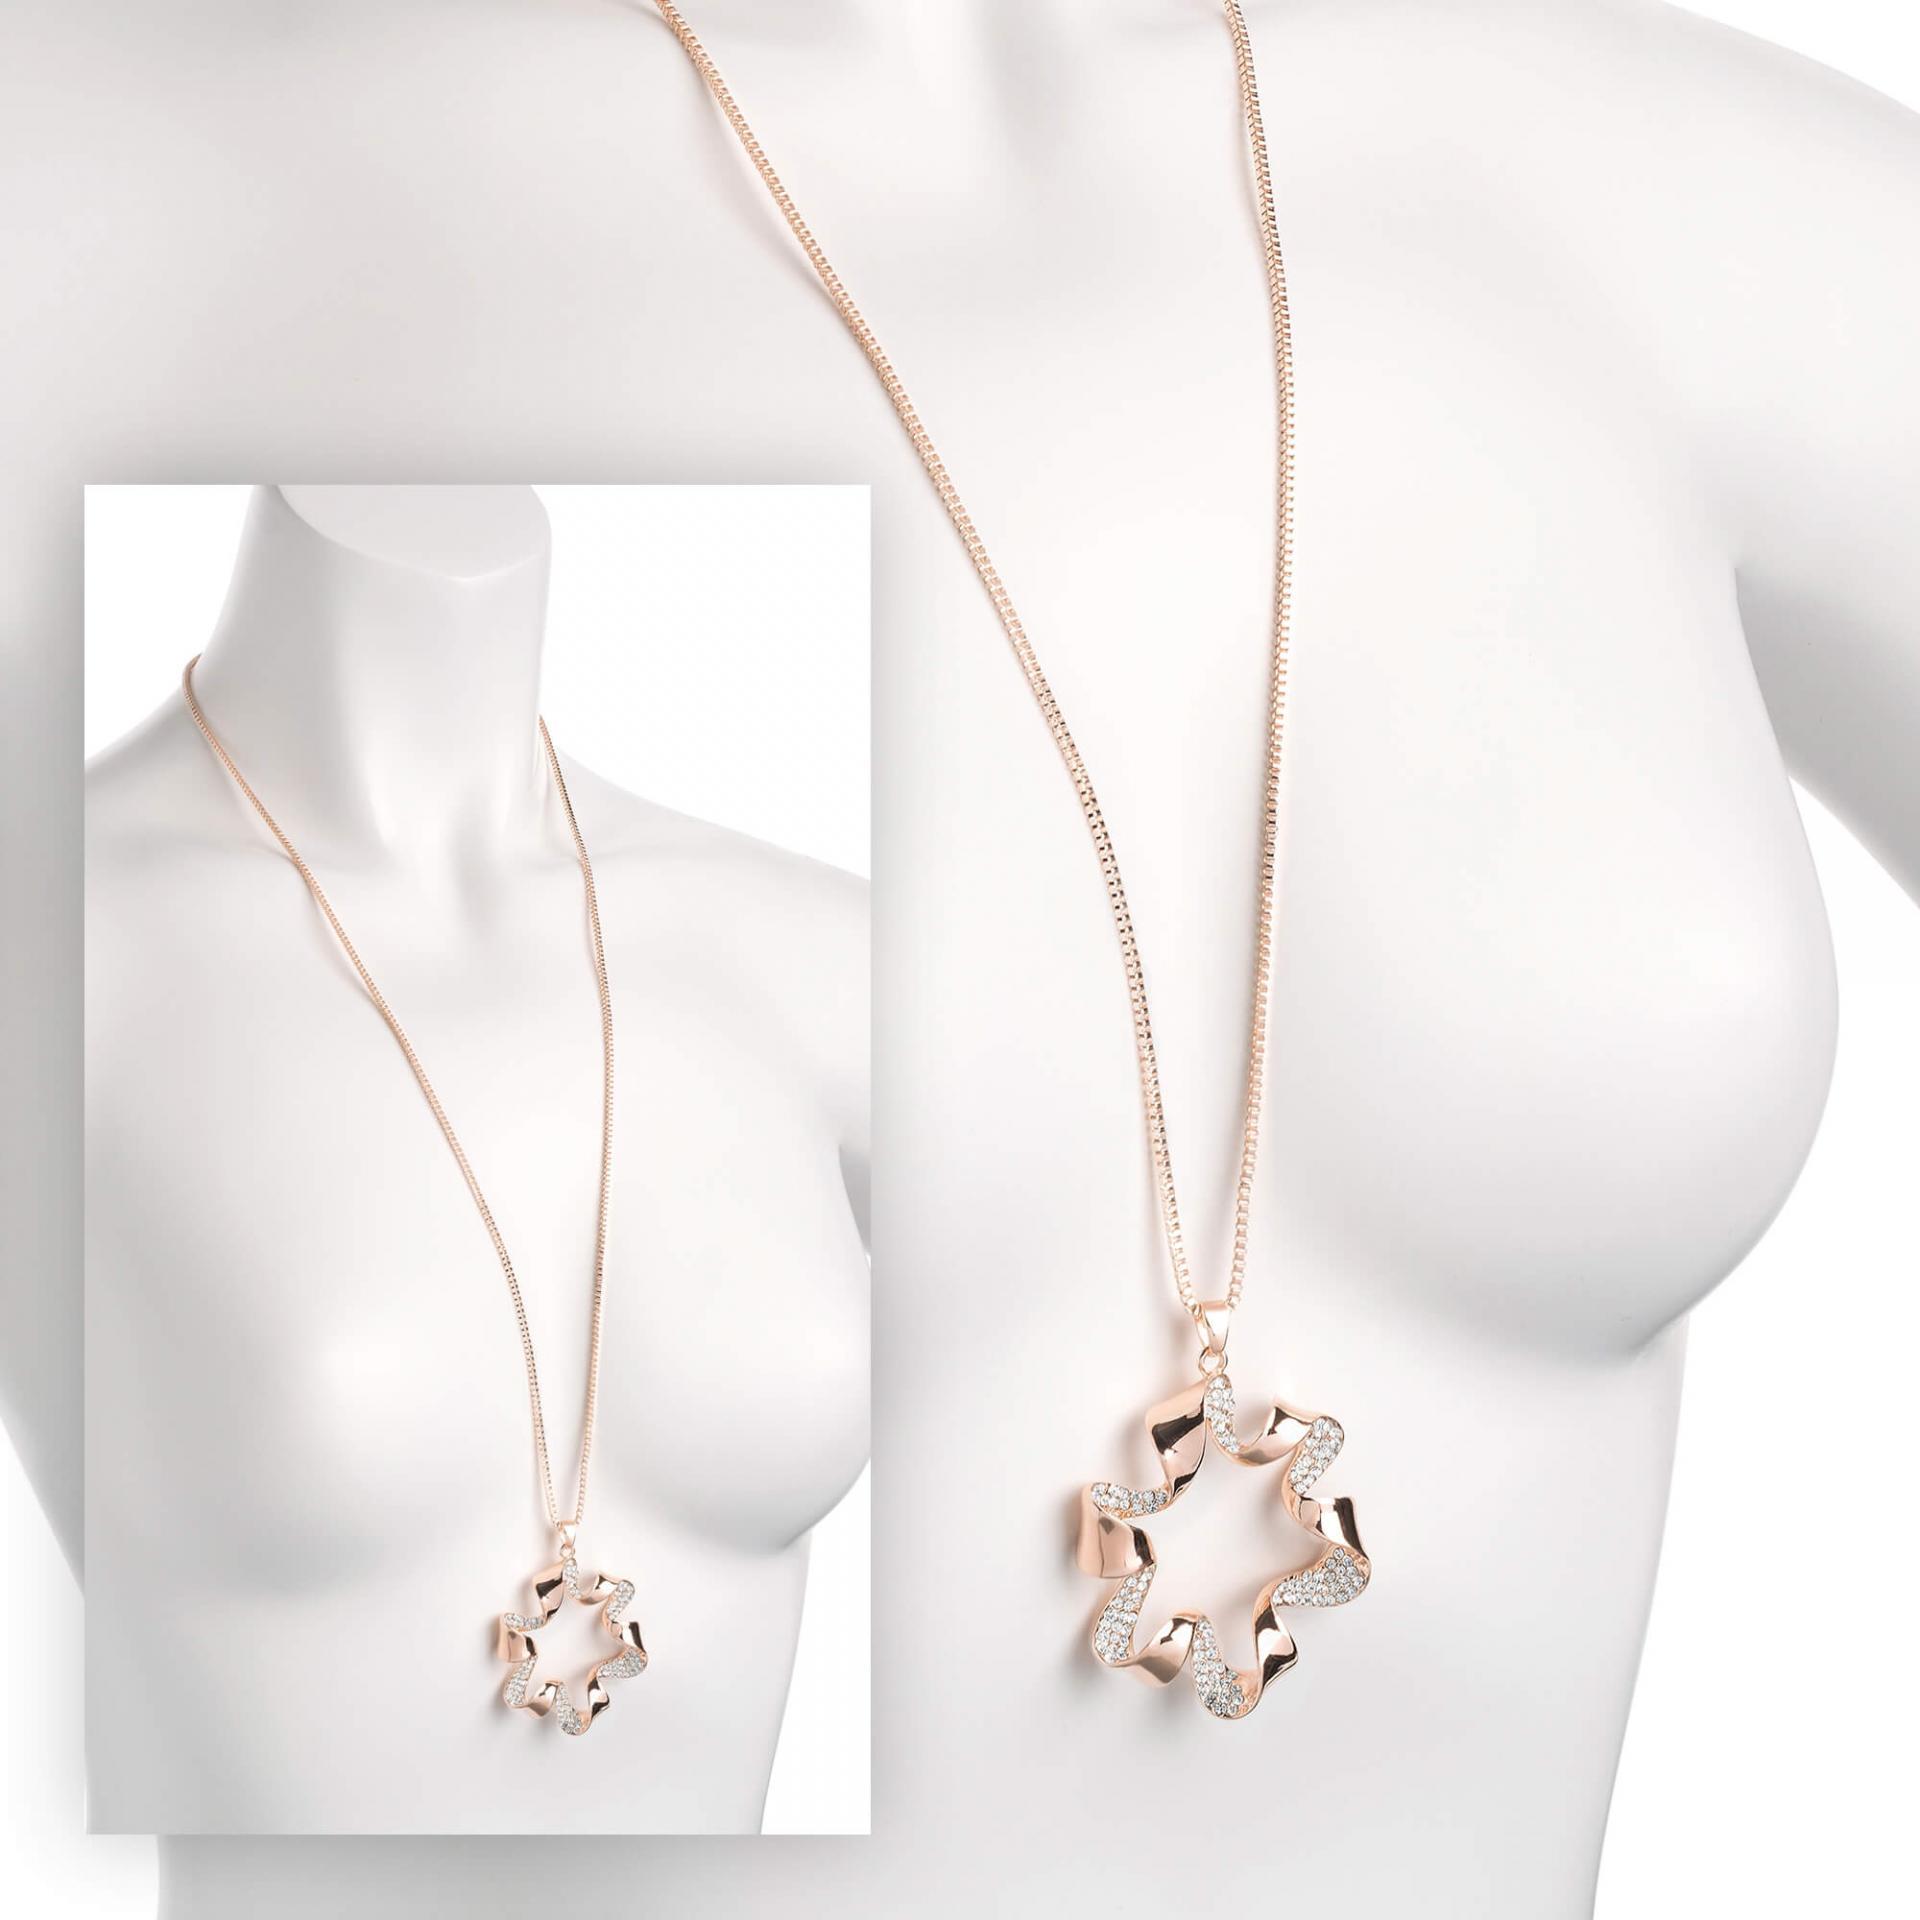 Sautoir chaine pendentif or rose fleur image 2019